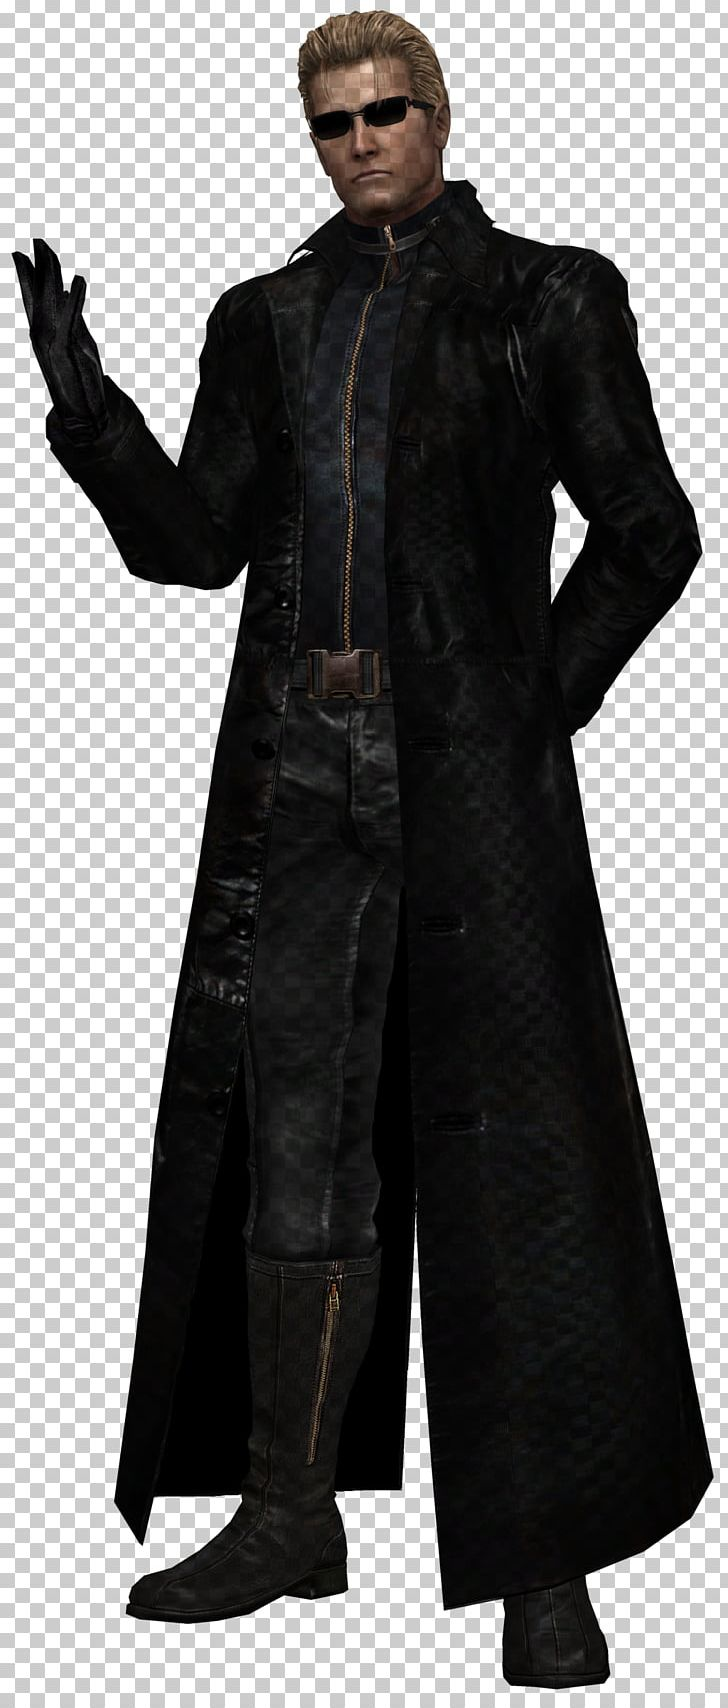 Jake muller clipart svg black and white Albert Wesker Resident Evil 5 Jake Muller Video Game PNG ... svg black and white